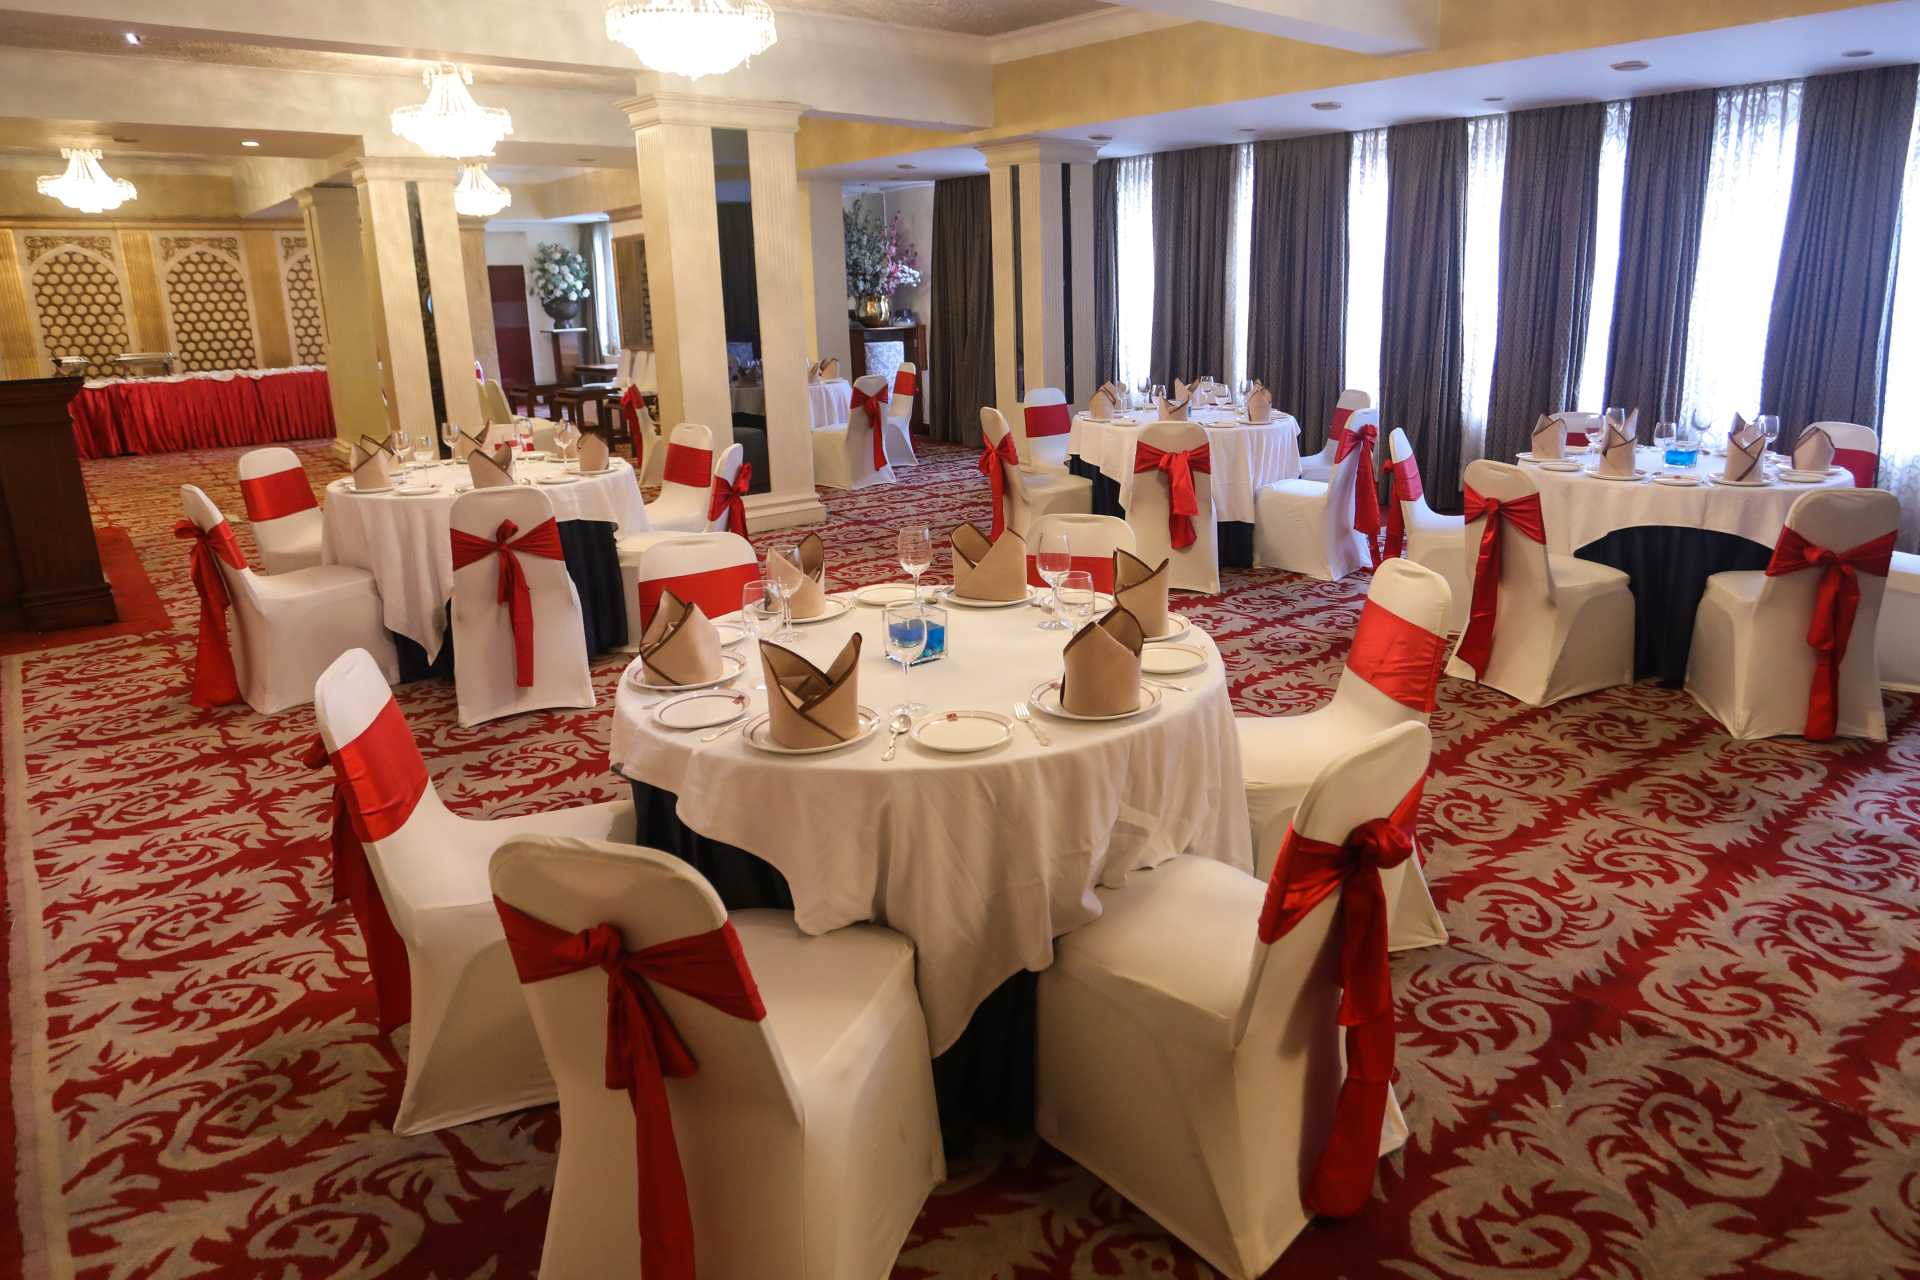 Banquet Halls In Mumbai  The Ambassador Mumbai  Events In Mumbai Hotels shiva panaroma - The Ambassador | Heritage Hotels in Mumbai, Aurangabad, Chennai - Meetings & Events